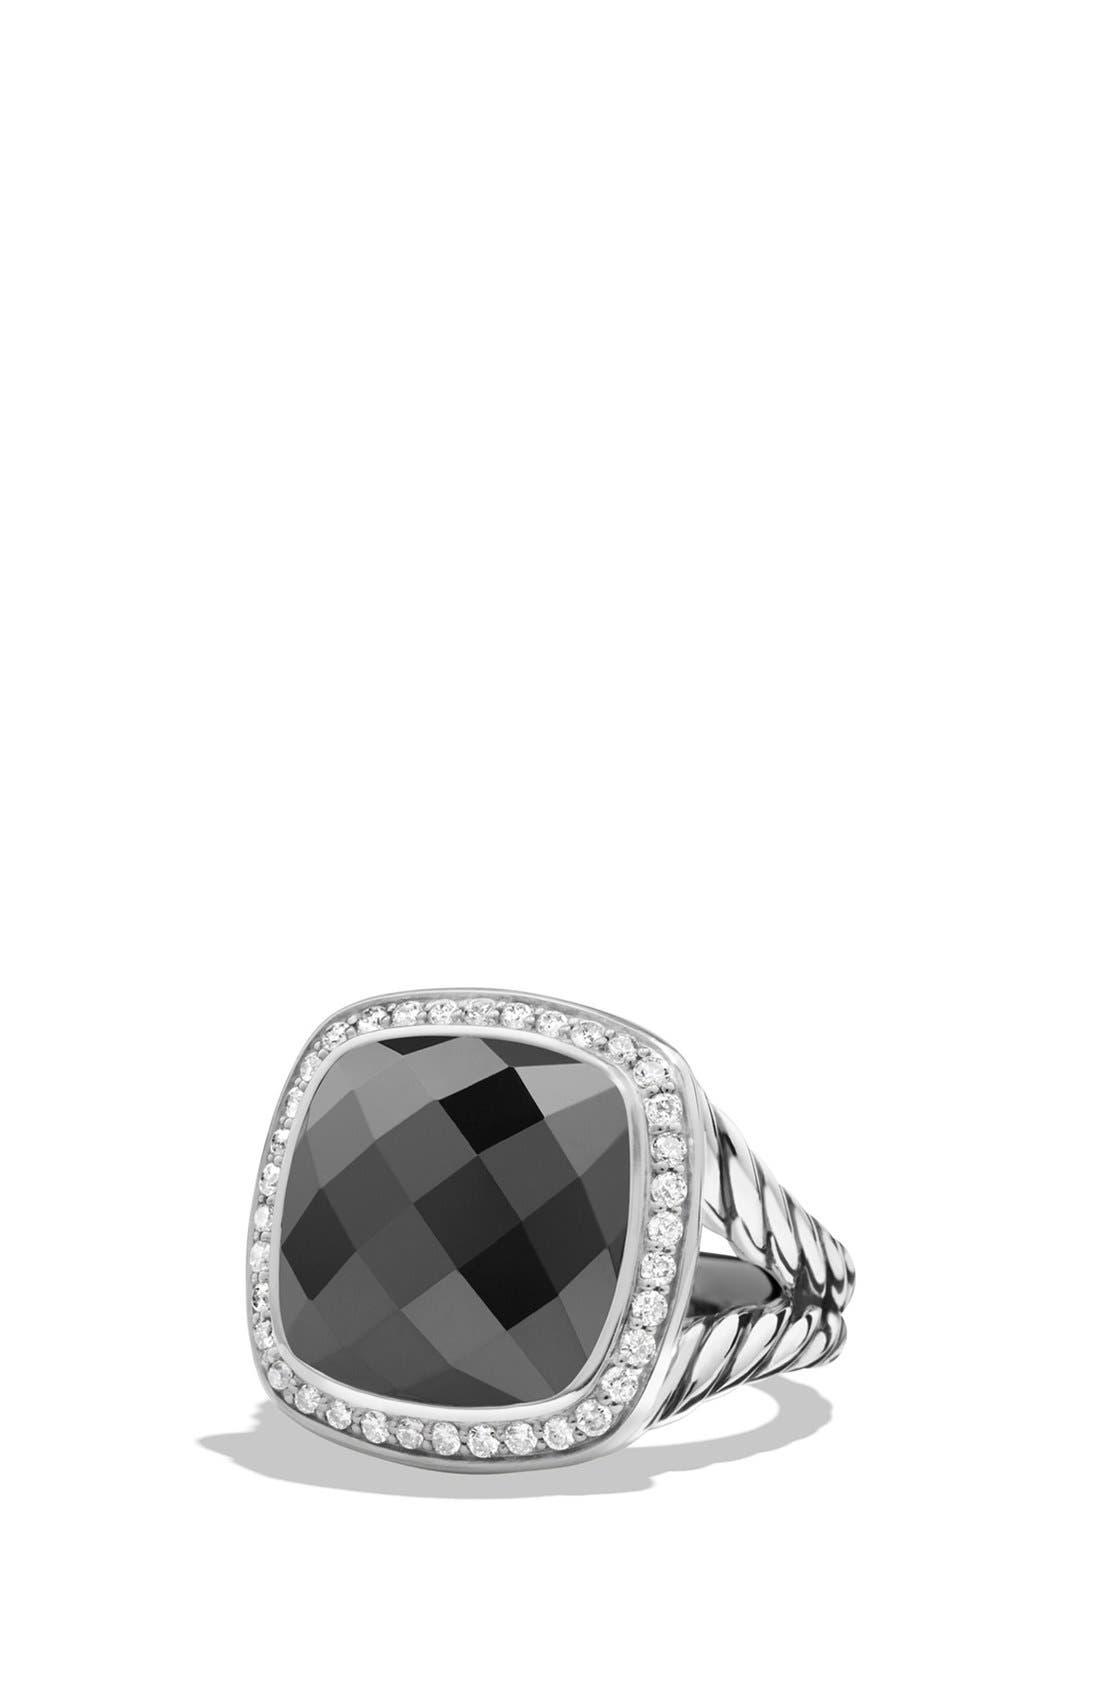 Alternate Image 1 Selected - David Yurman 'Albion' Ring with Semiprecious Stone and Diamonds